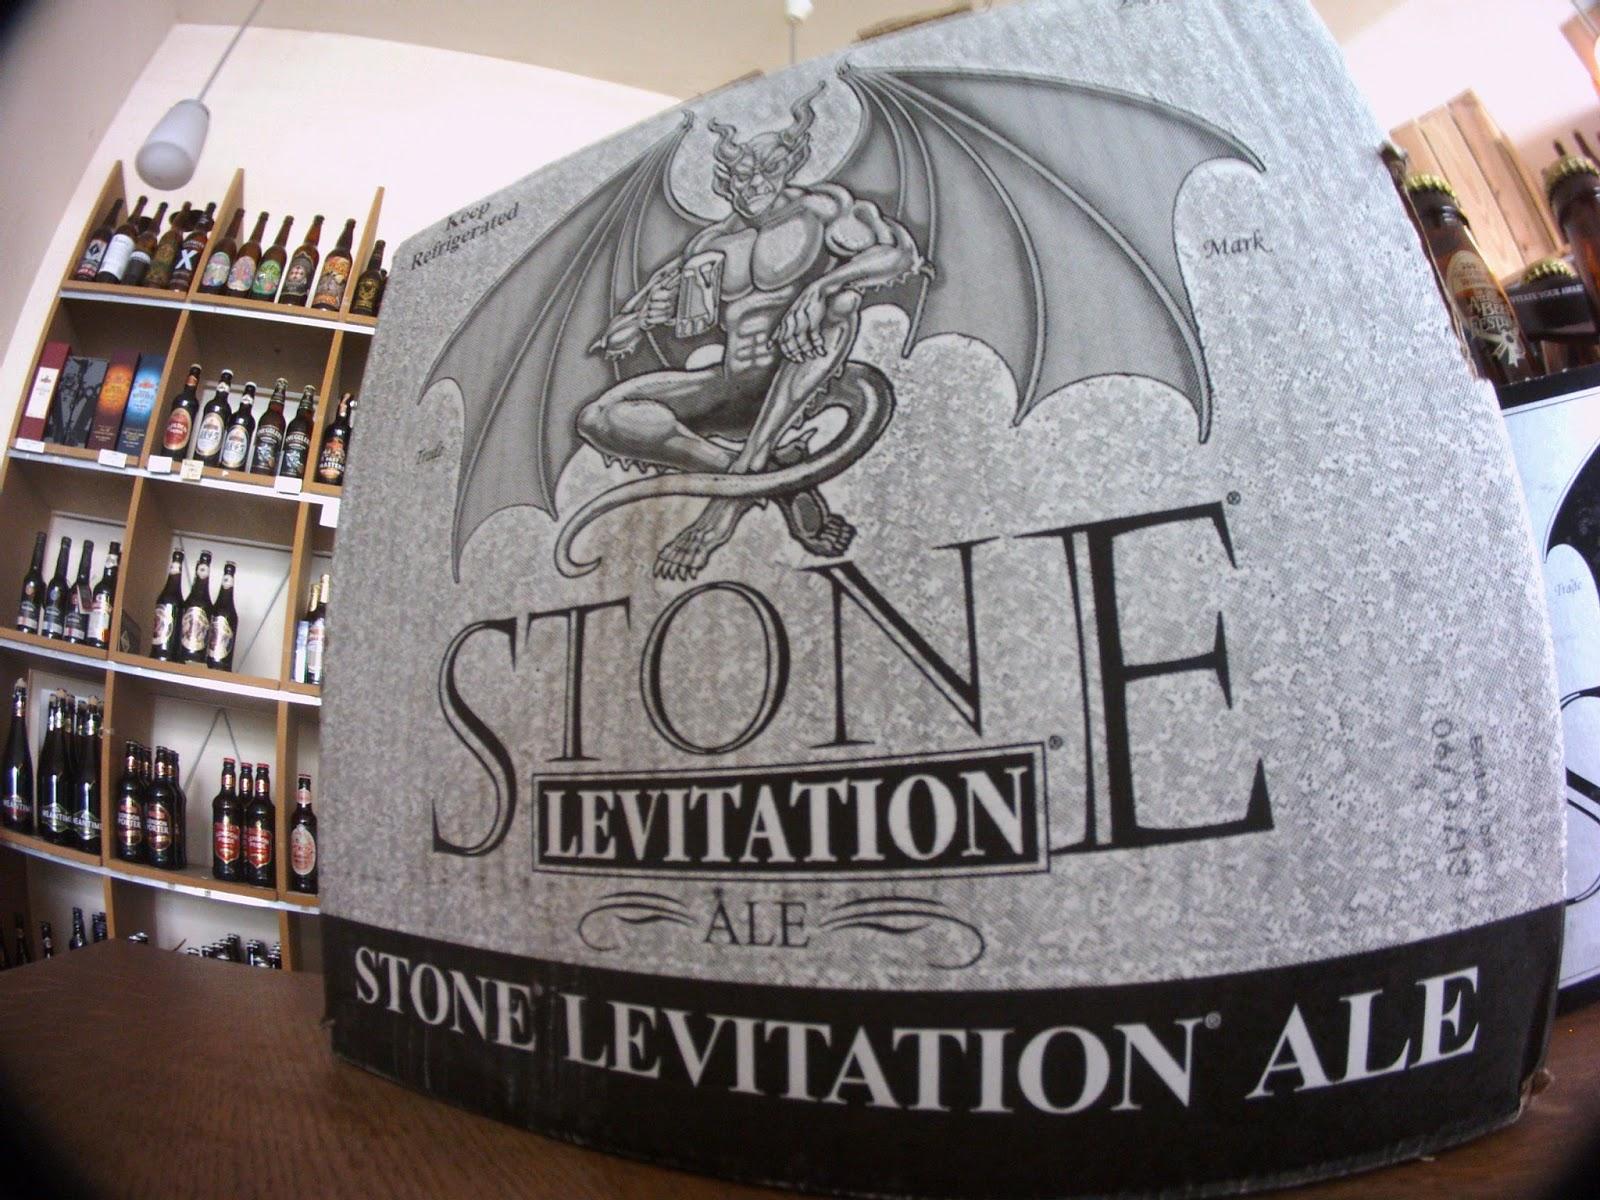 Stone Levitation Ale : Berlin bier shop stone brewing